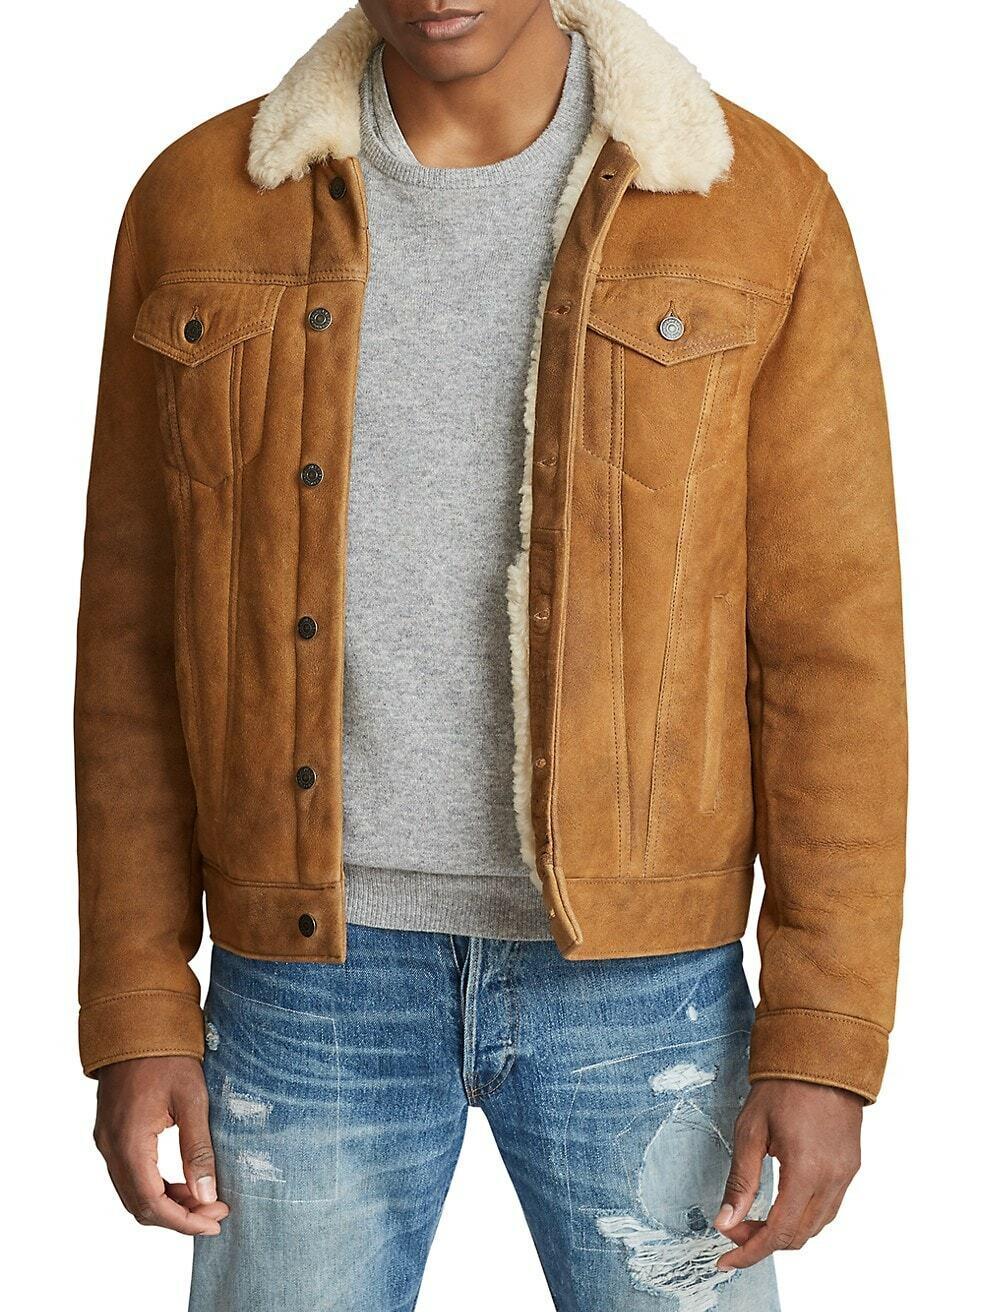 ,498 Polo Ralph Lauren Mens Shearling camionero cuero chaqueta abrigo de piel de oveja